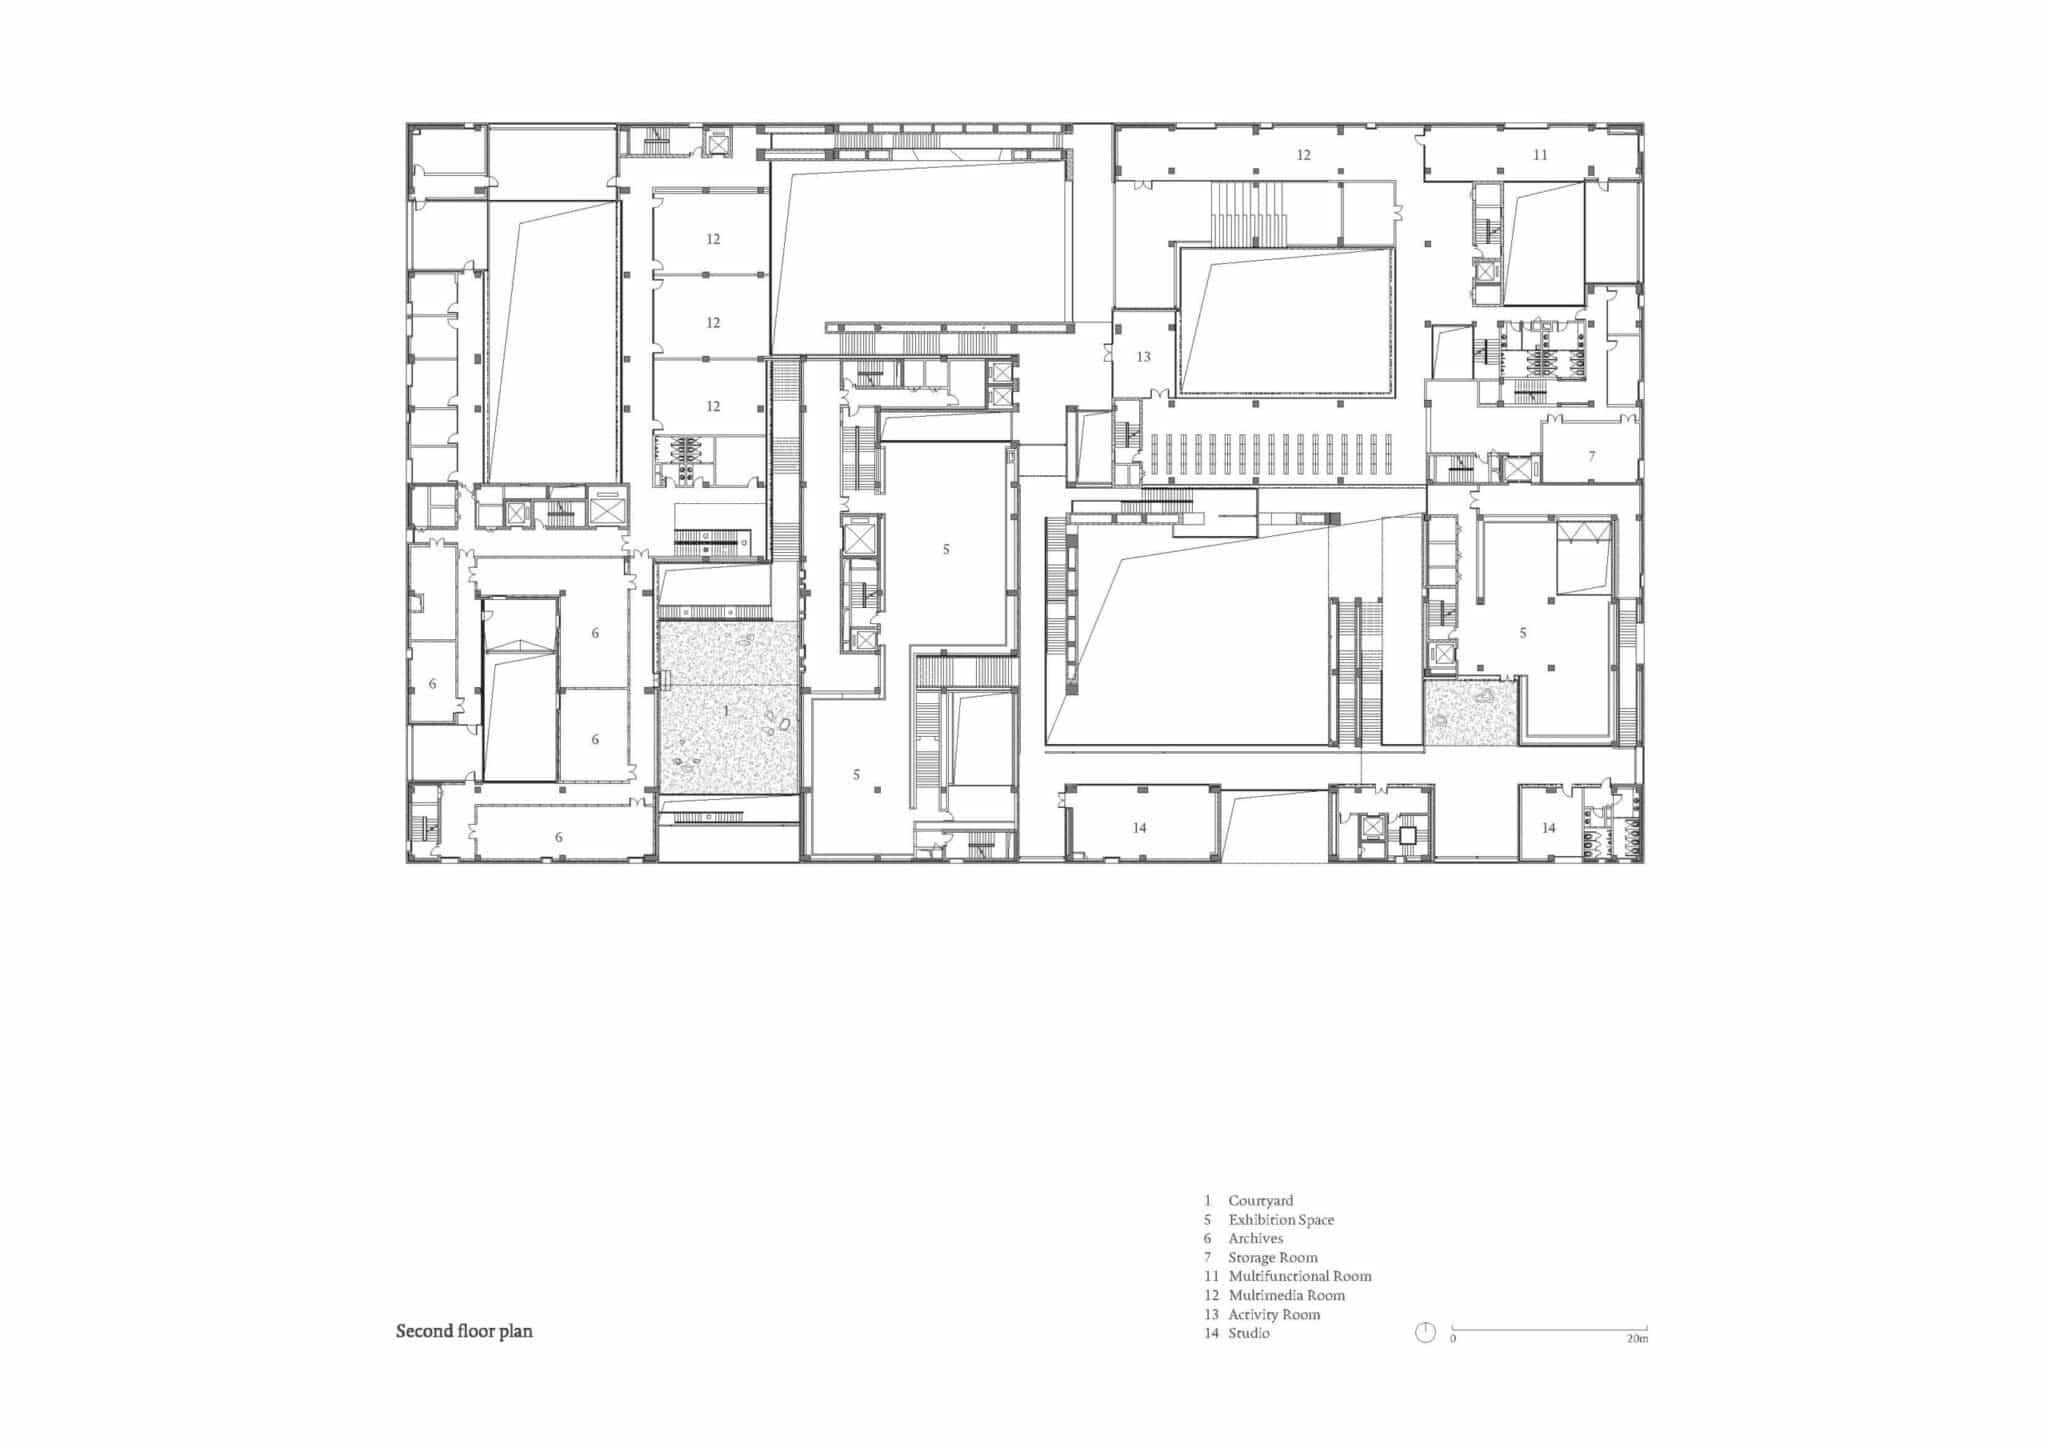 Shou County Culture and Art Center  - 20210702 Zhu Pei ShouCountyCultureArtCenter 12.2.2 scaled 63